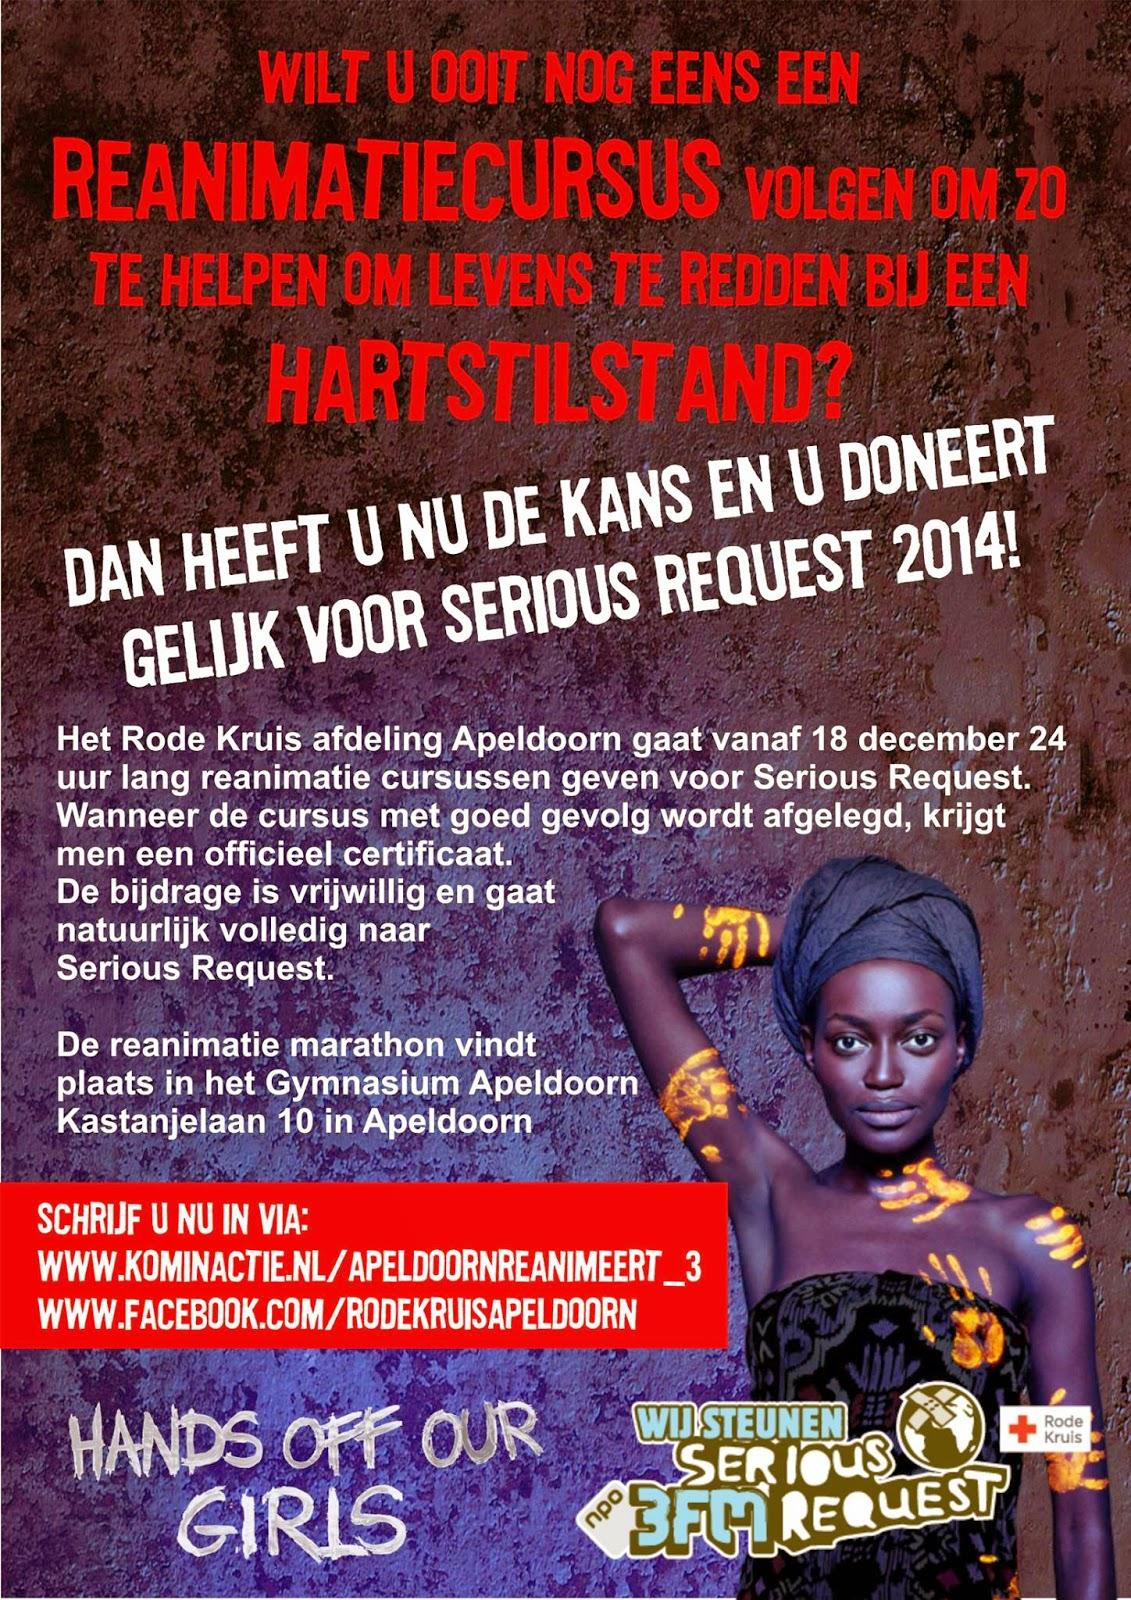 http://www.rodekruis.nl/afdeling/apeldoorn